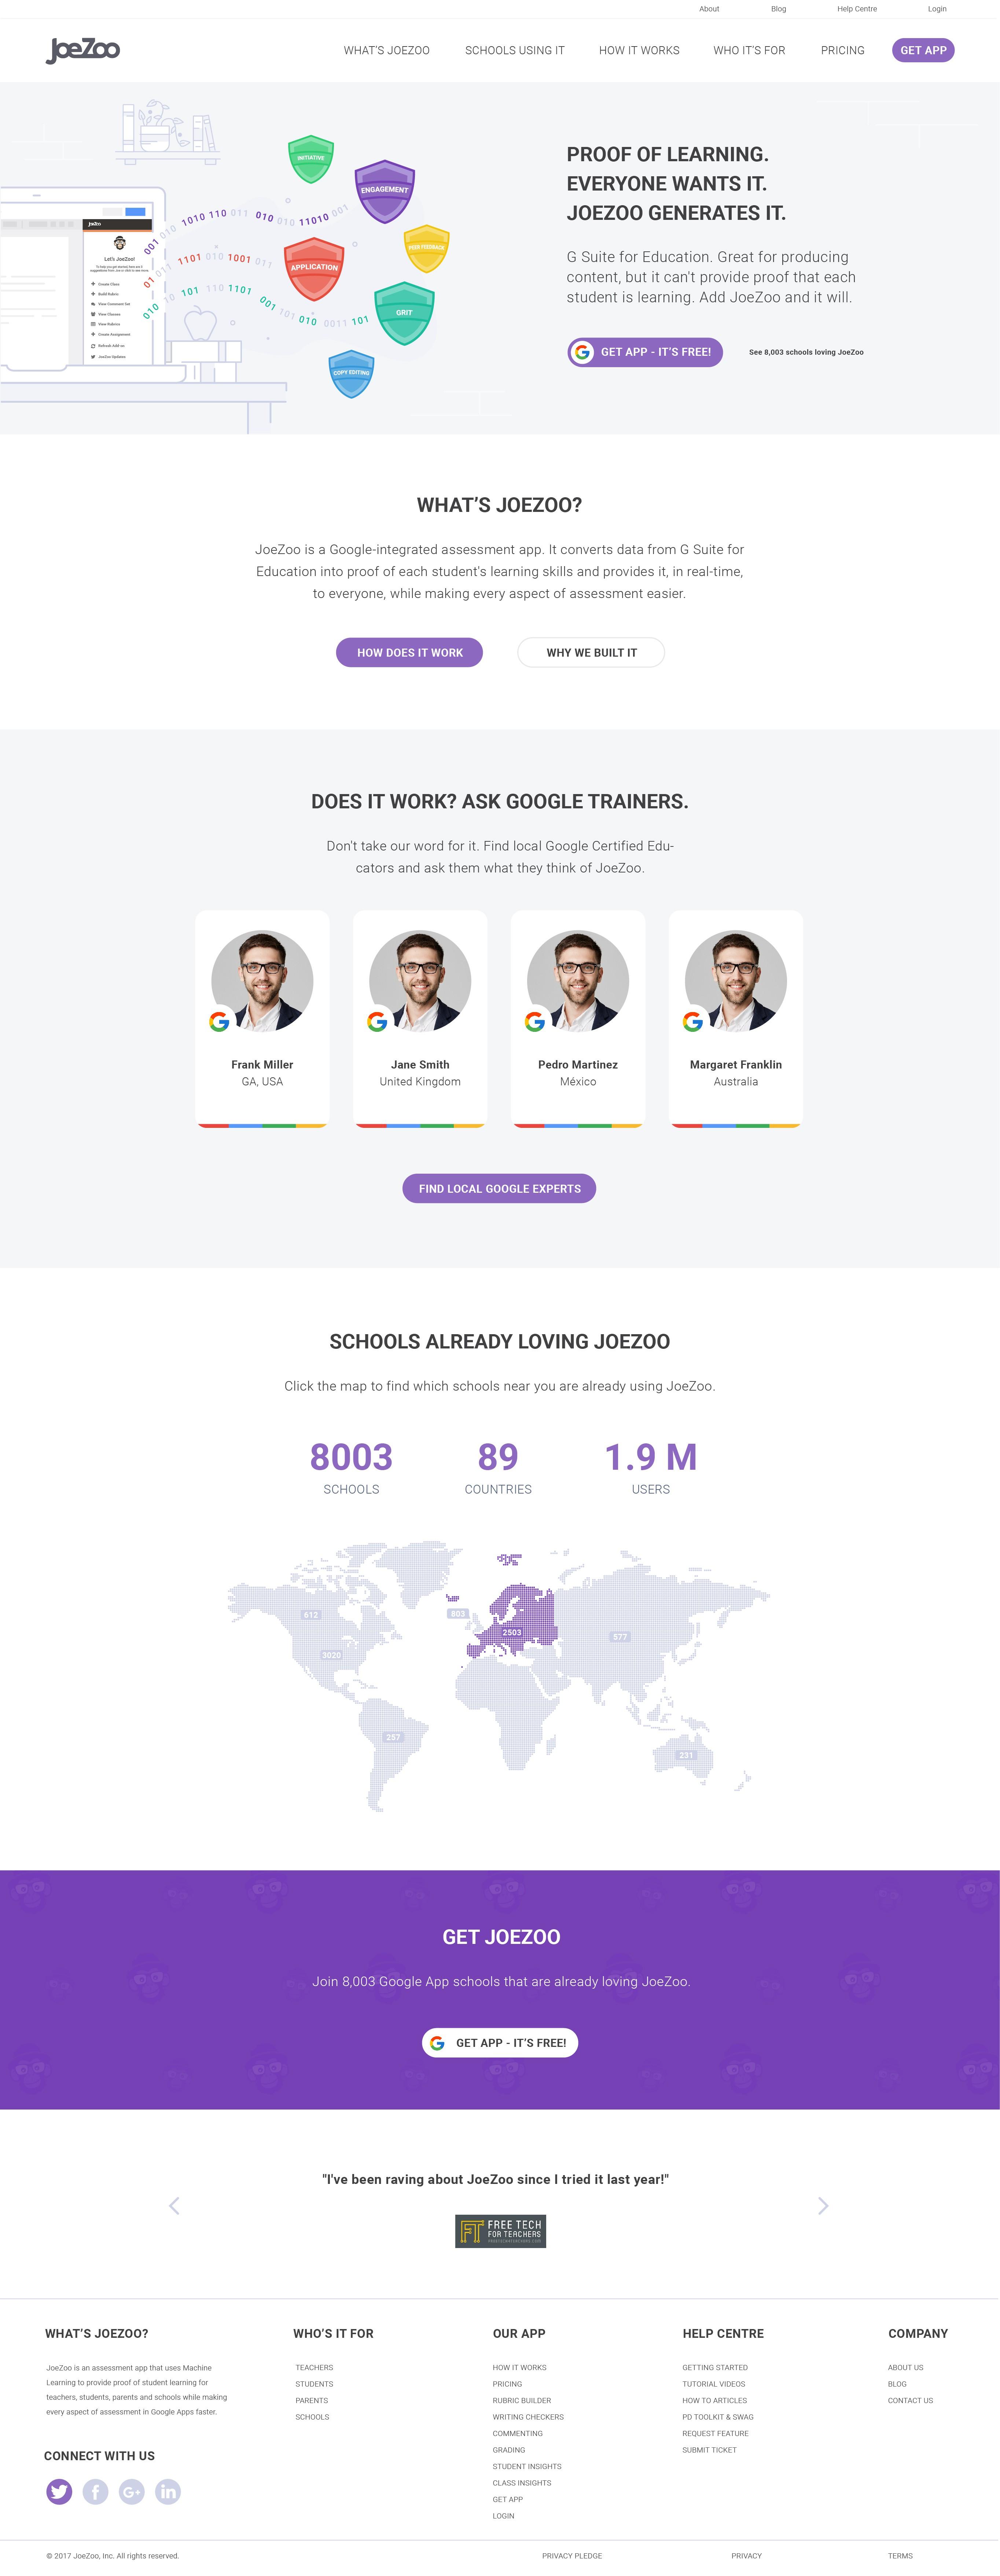 Design a new website for most popular Google integrated app